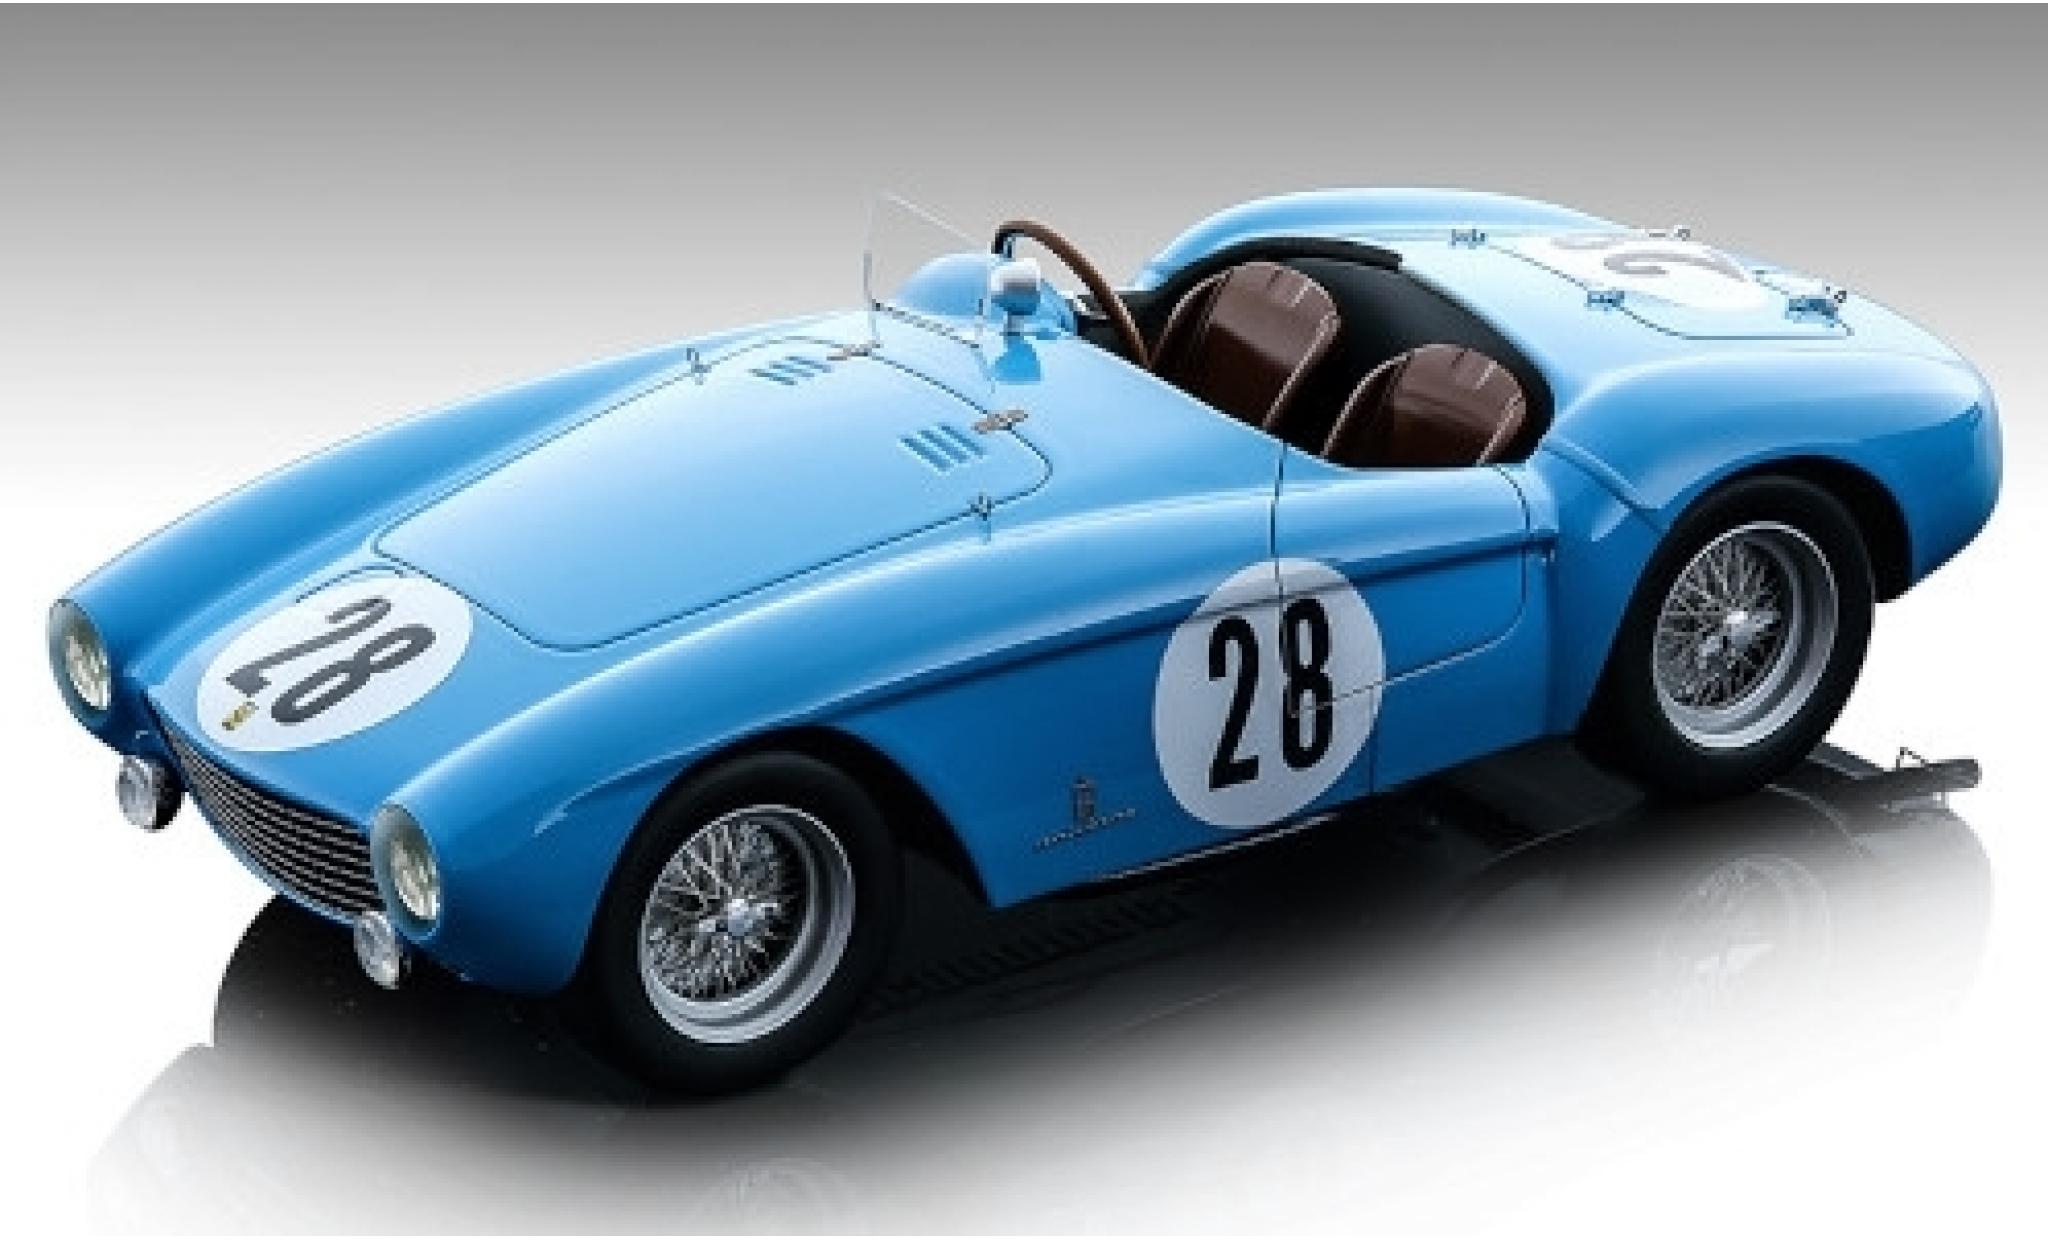 Ferrari 500 1/18 Tecnomodel Mondial RHD No.28 GP Reims 1954 Ricard/Pozzi